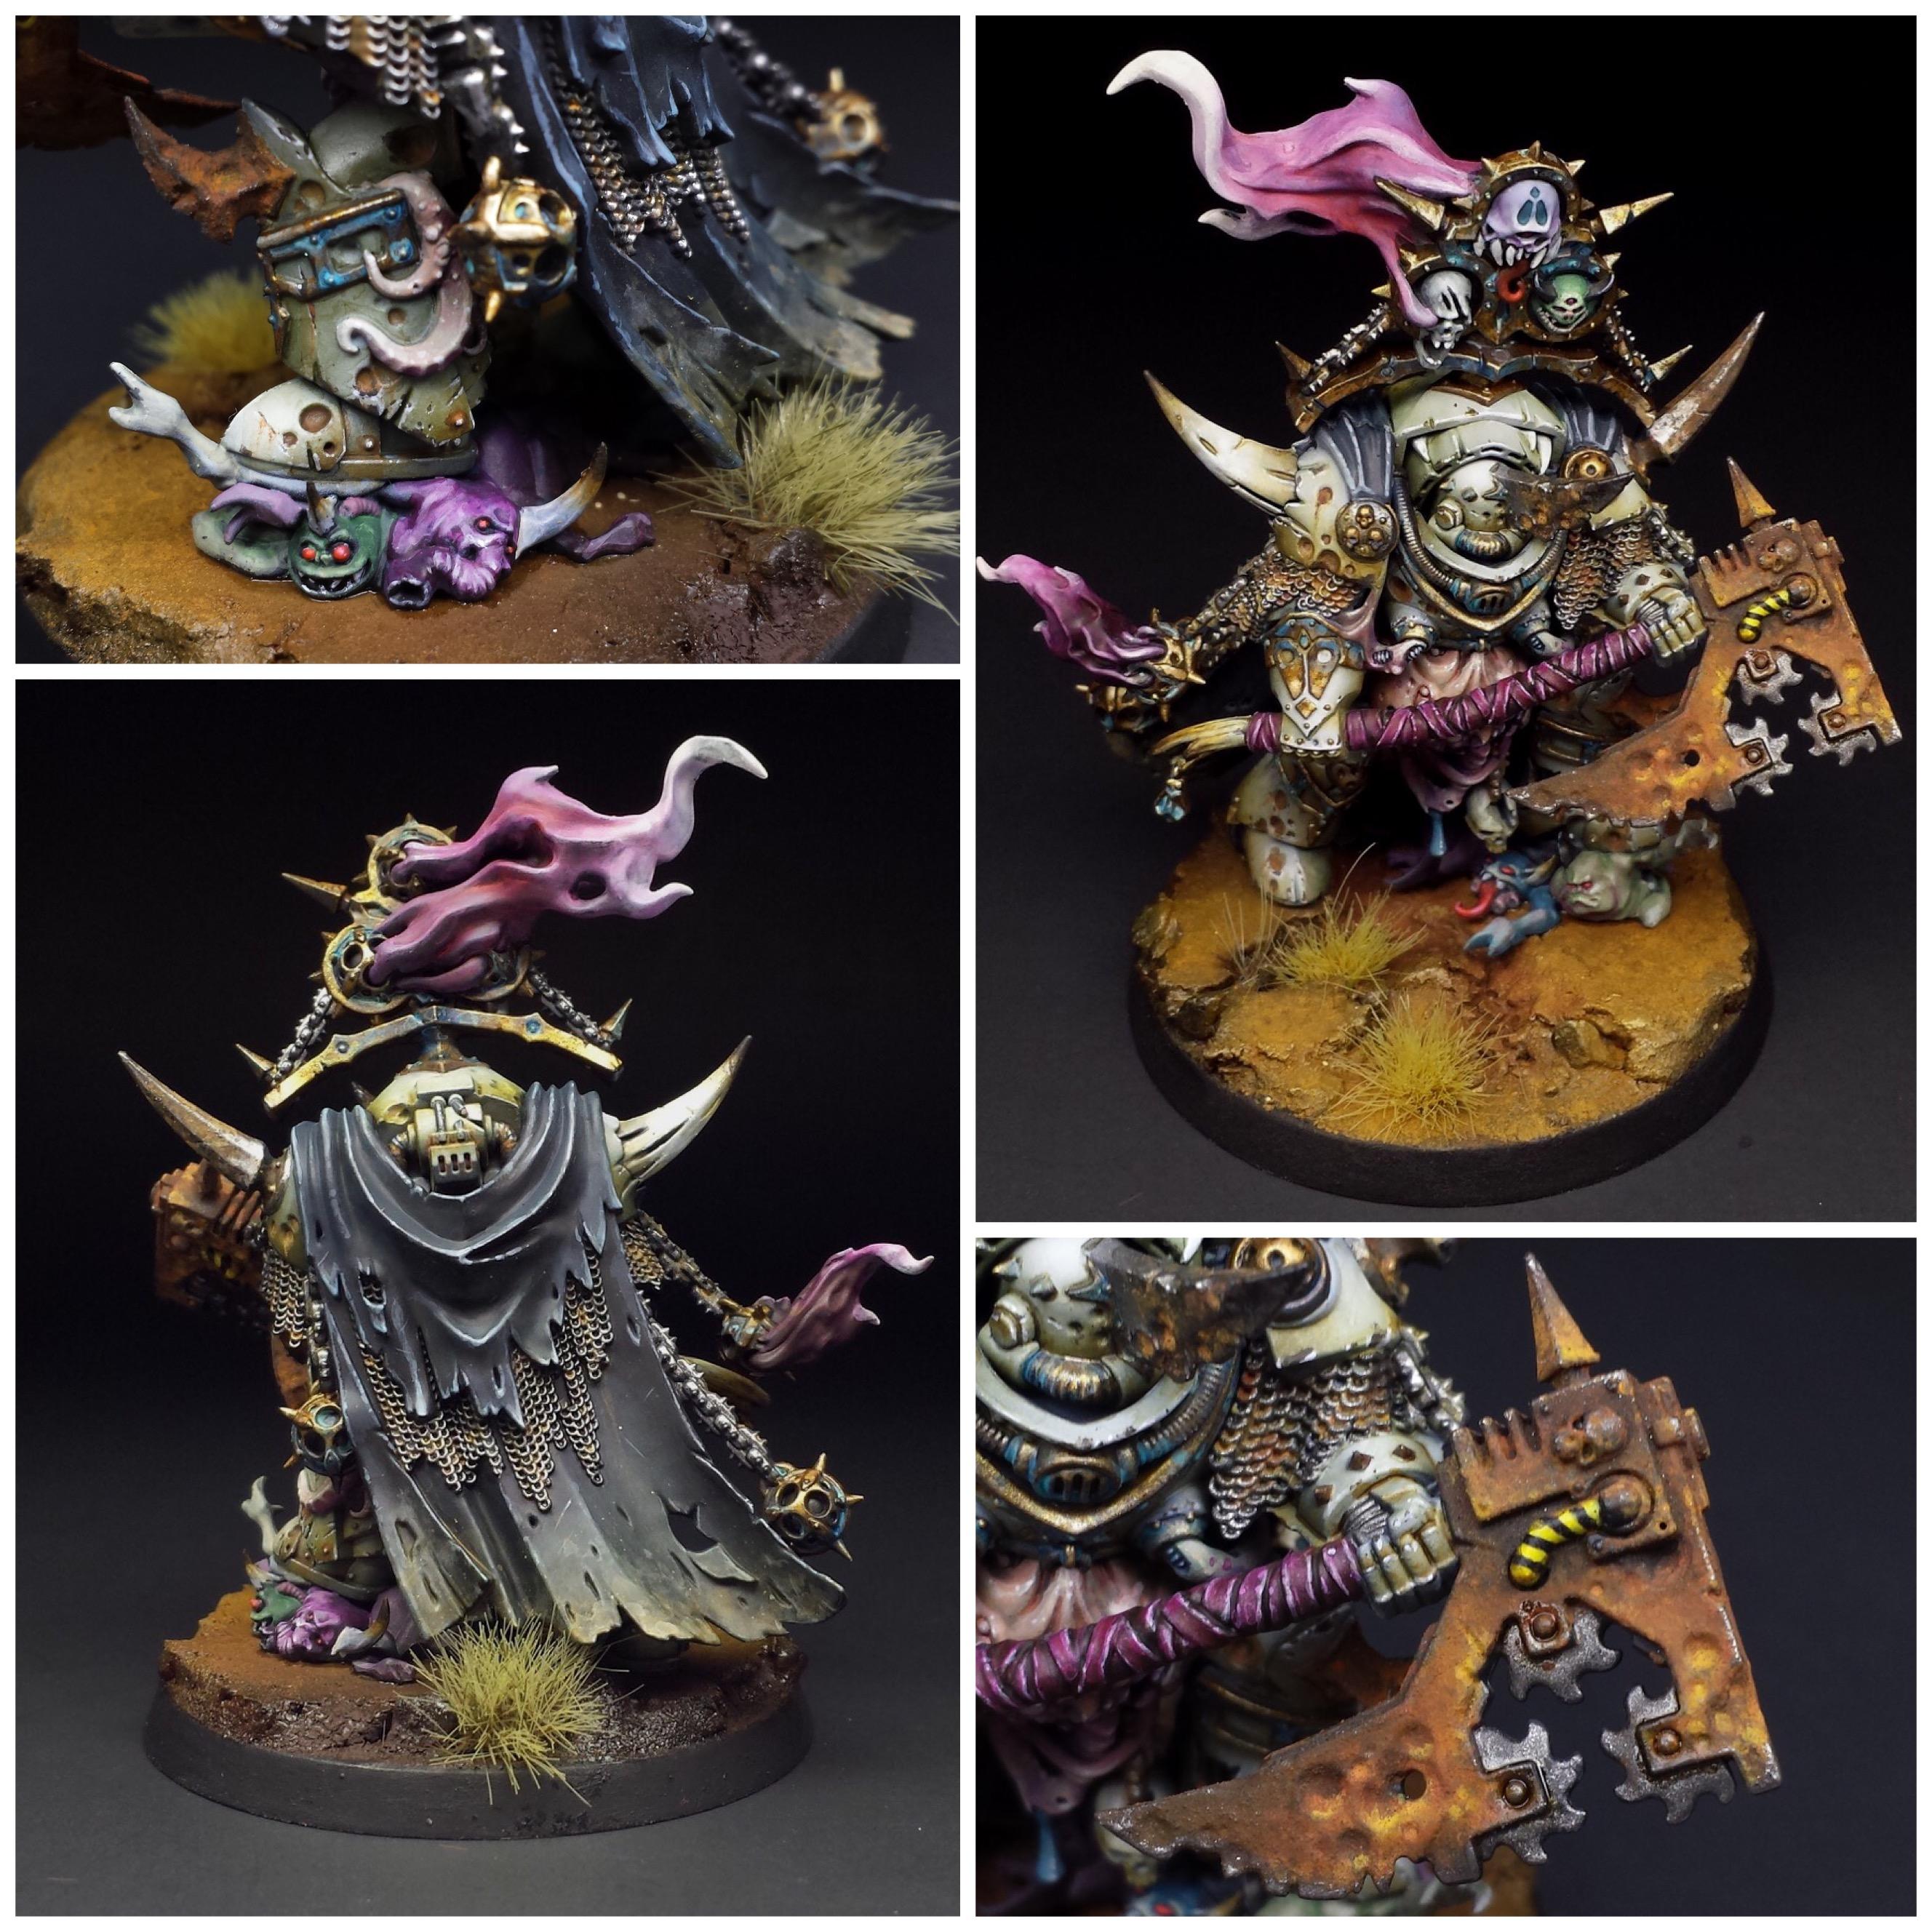 Warhammer 40k Dark Imperium Lord of Contagion